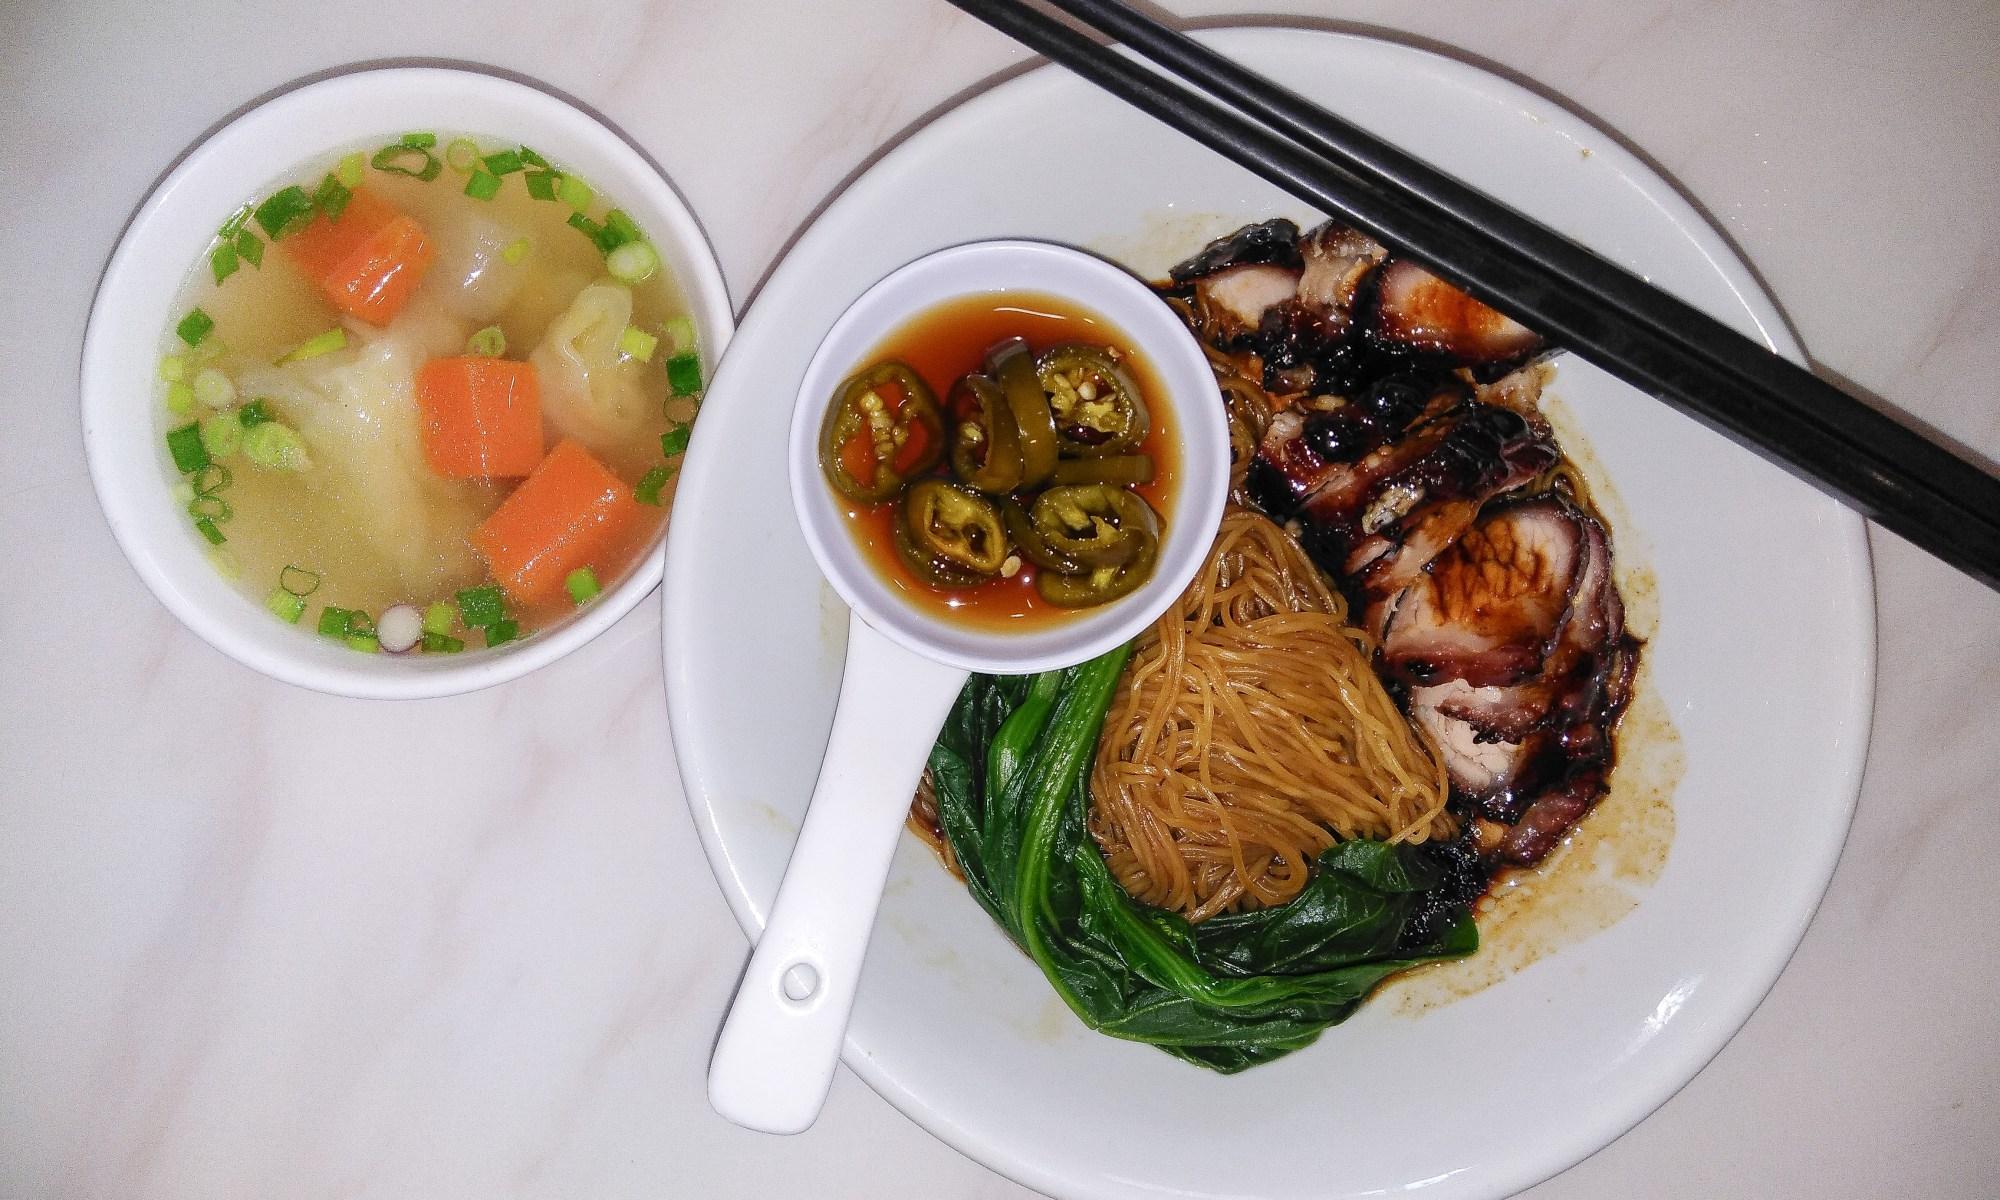 My Little Herbal Tea Taman Megah Pj Roasted Pork Curry Mee Da Bomb Thefoodbunny